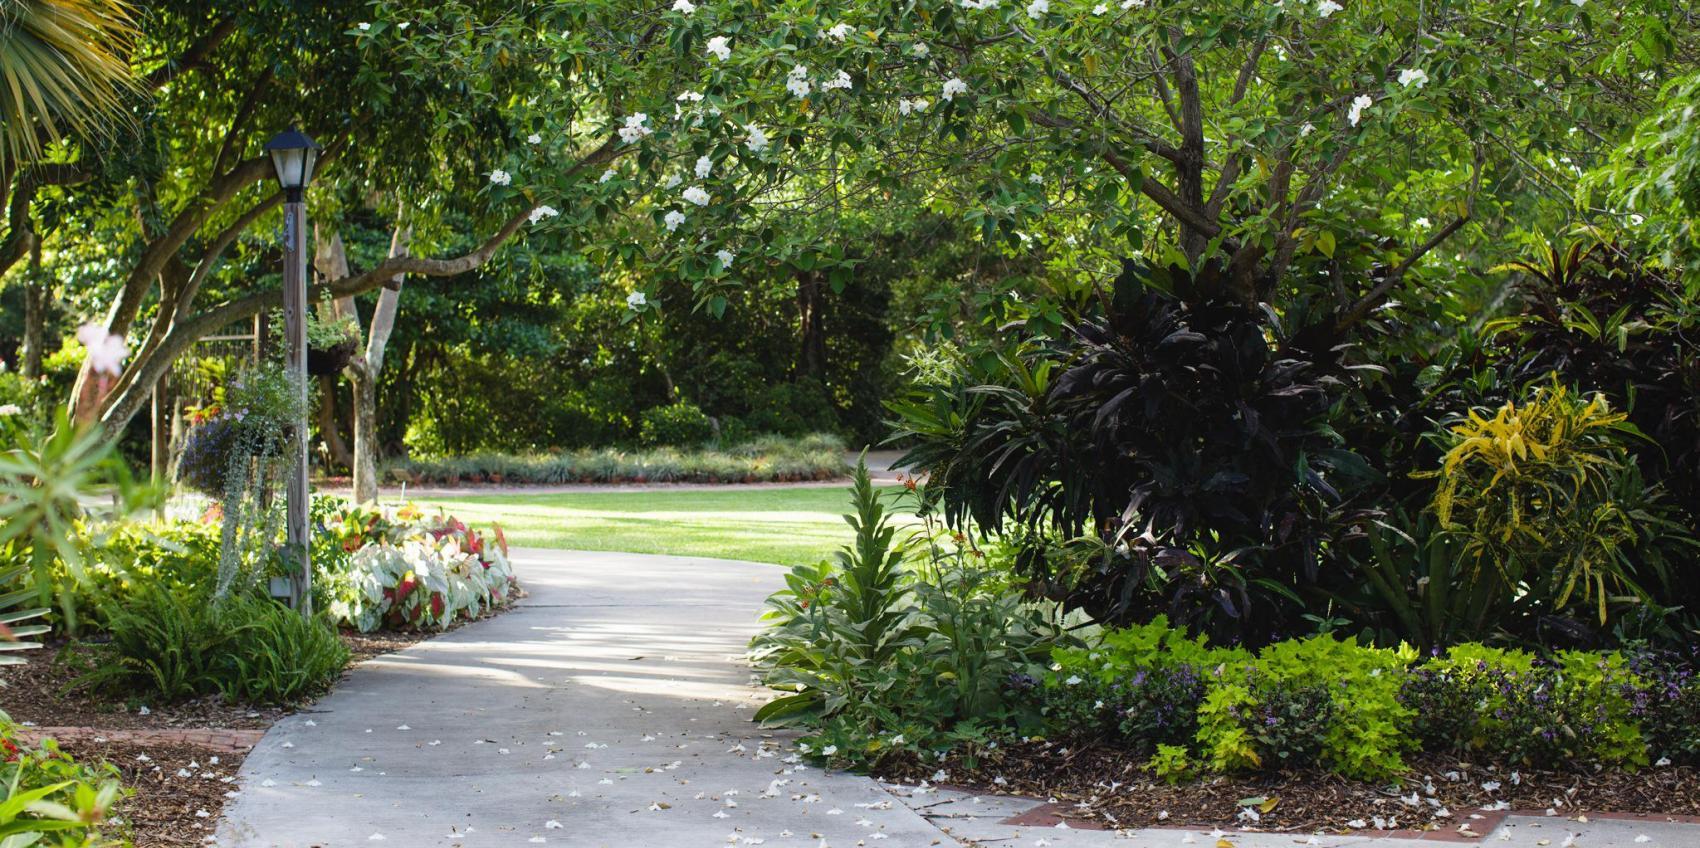 Heathcote Botanical Gardens American Public Gardens Association